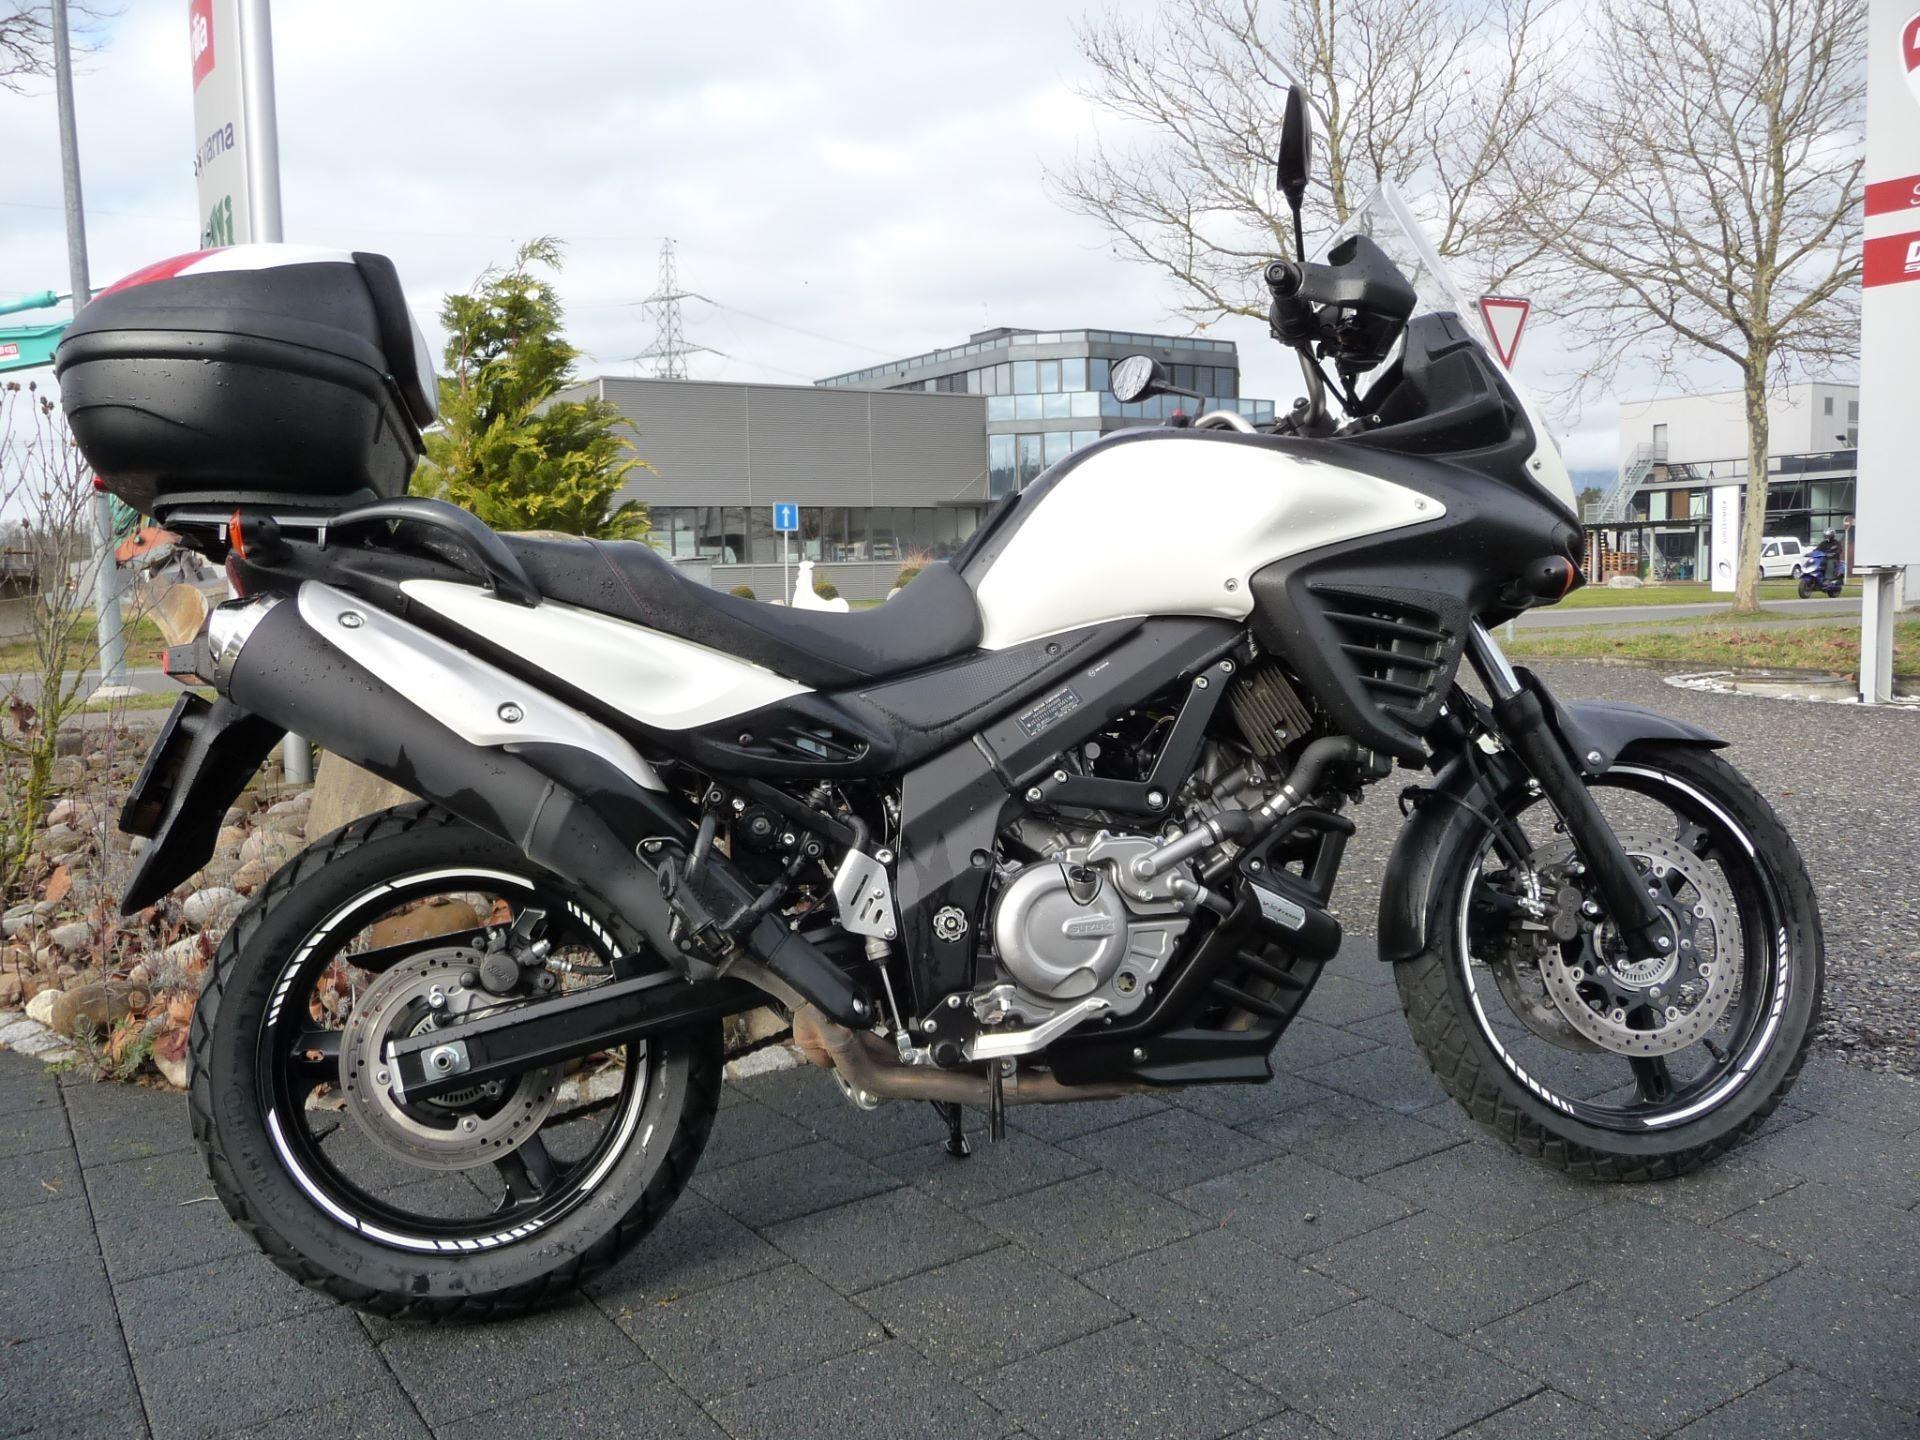 moto occasions acheter suzuki dl 650 a v strom abs moto kaufmann lyss lyss. Black Bedroom Furniture Sets. Home Design Ideas